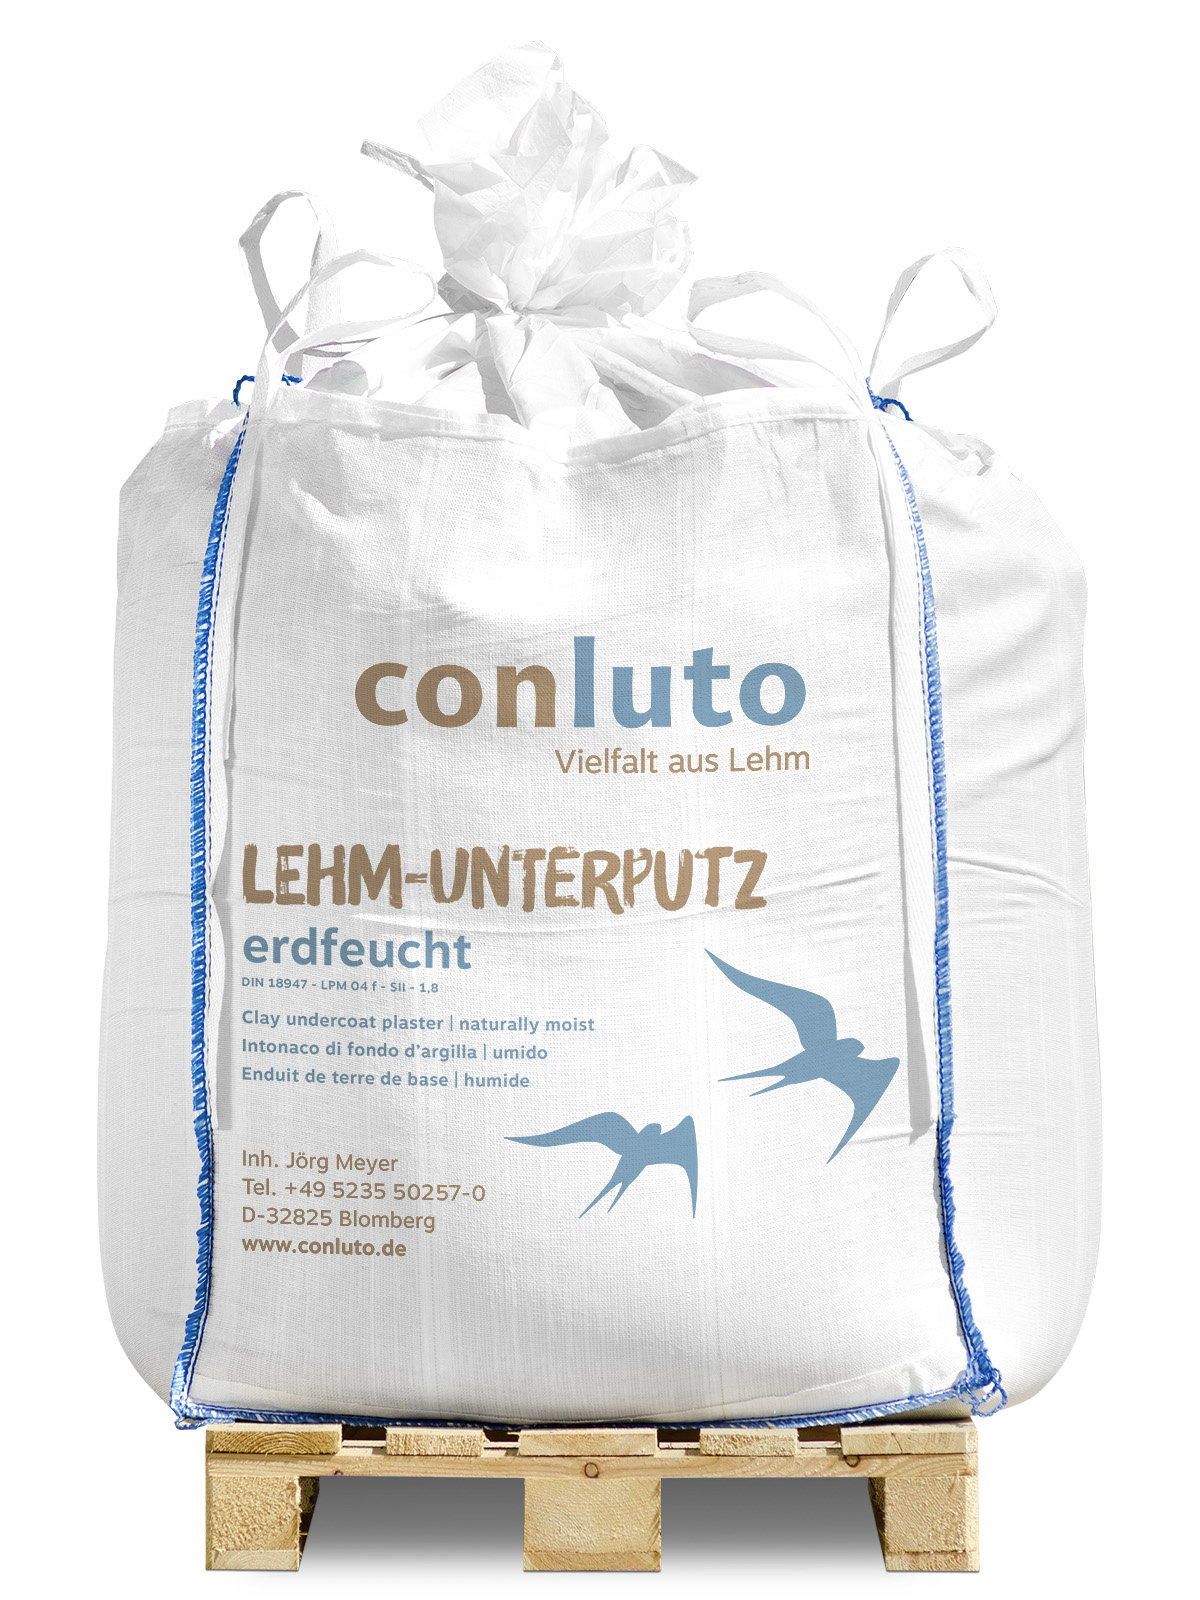 conluto Lehm-Unterputz erdfeucht